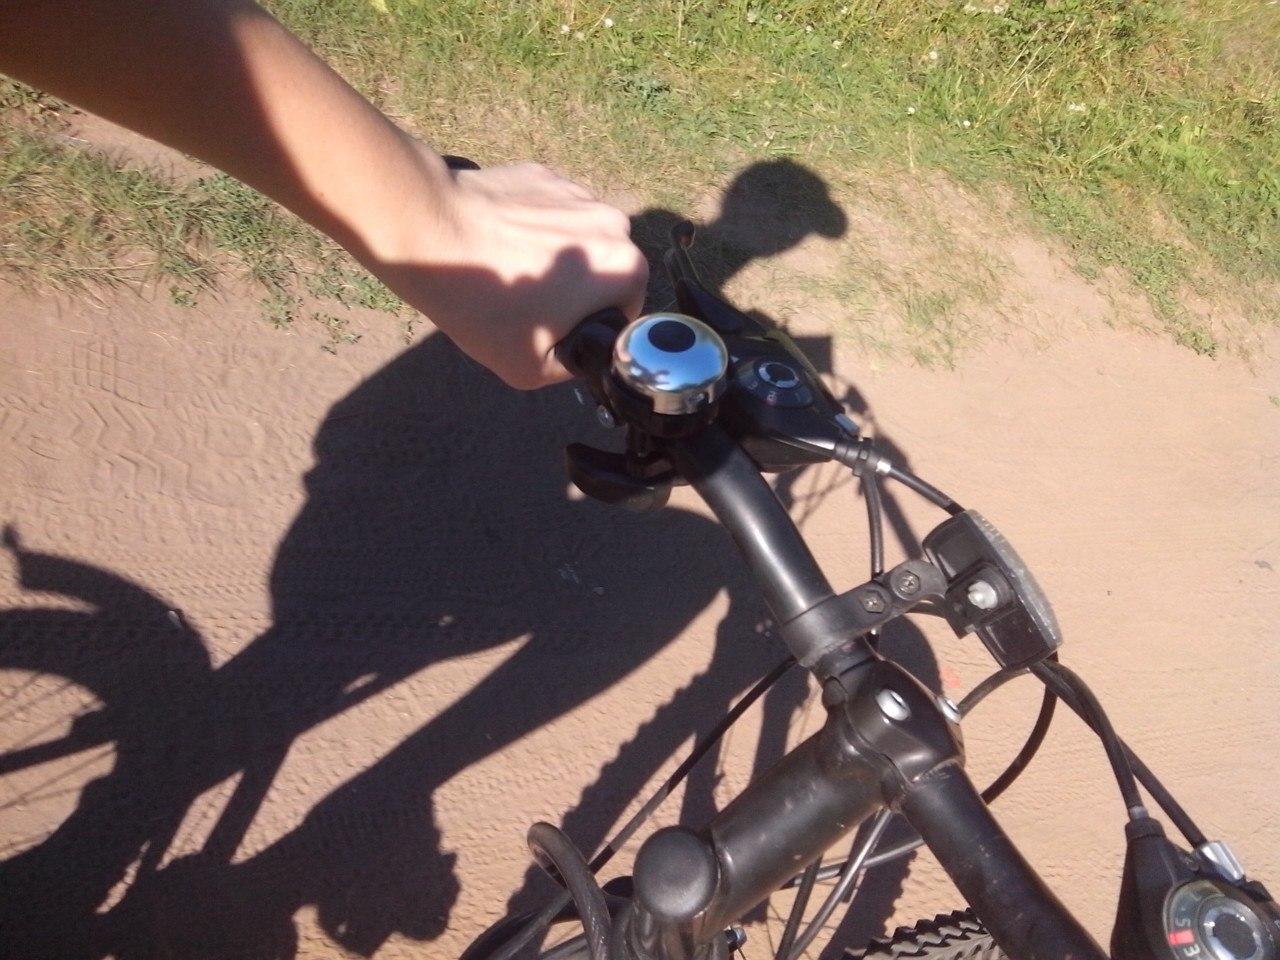 Велосипед-друг человека. Блиц: тени